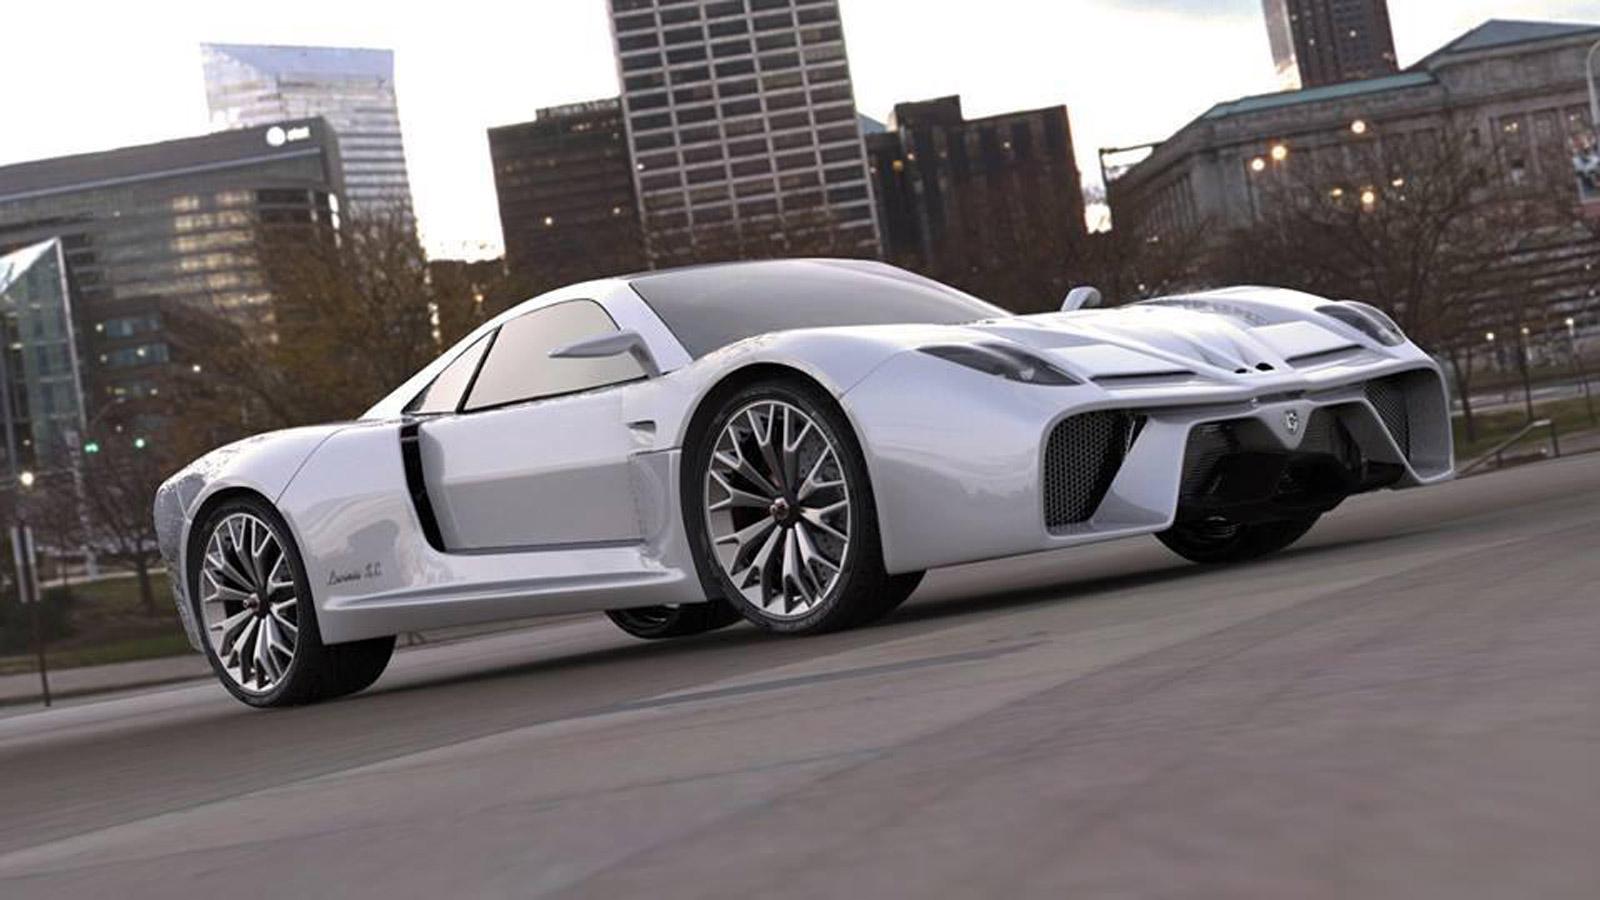 test drive grand new veloz 1.3 avanza vs italian firm plans electric supercar